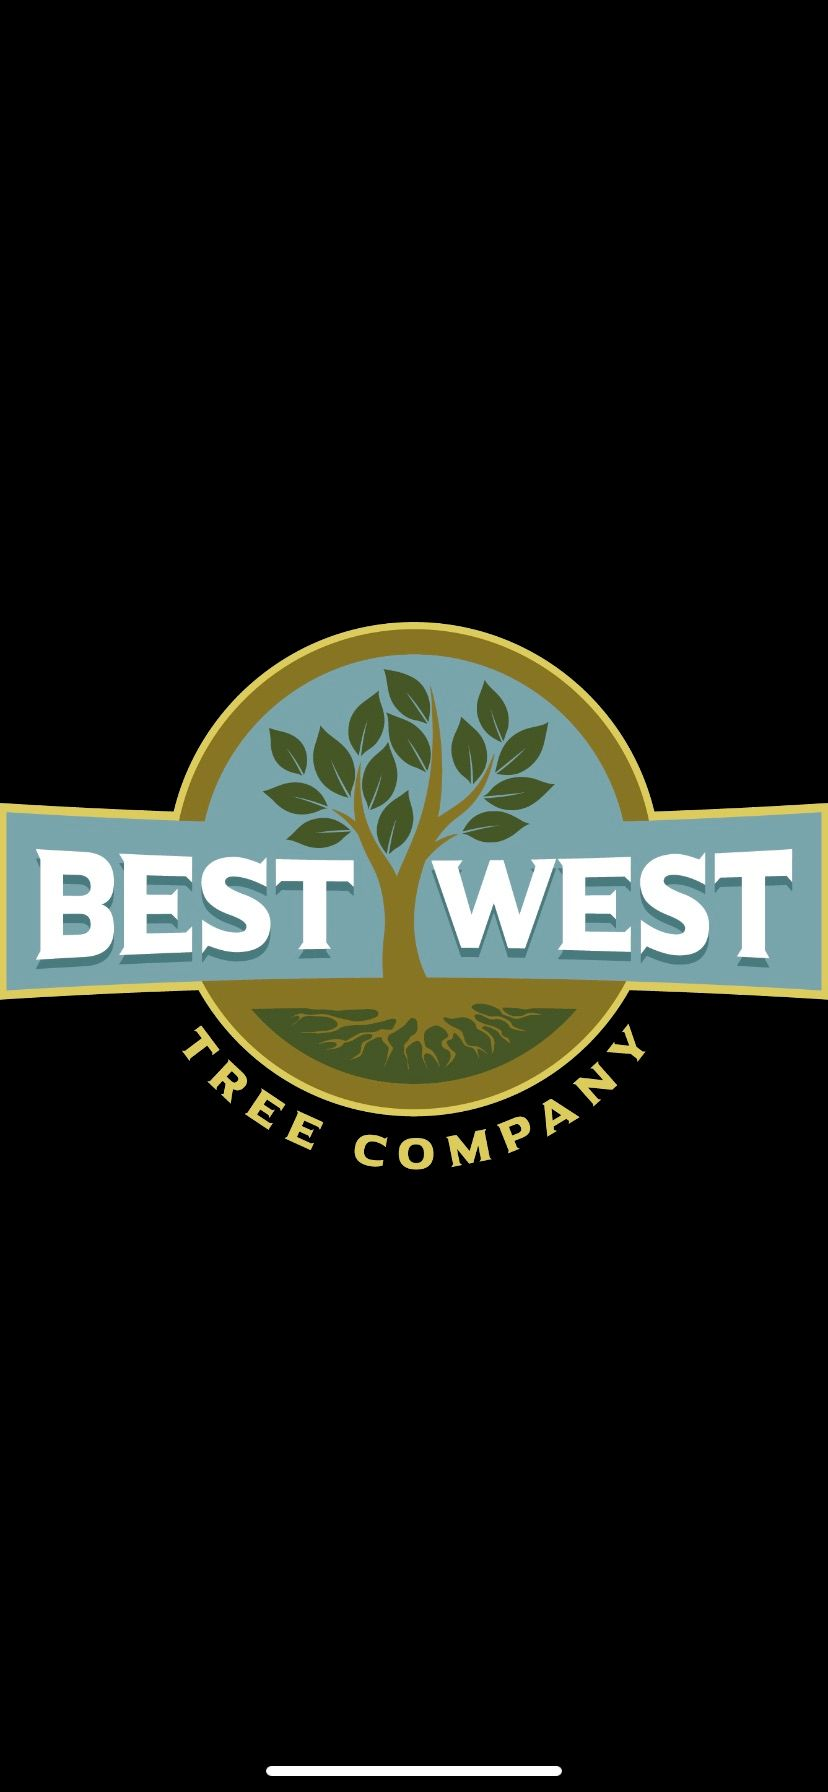 Best West Tree Company